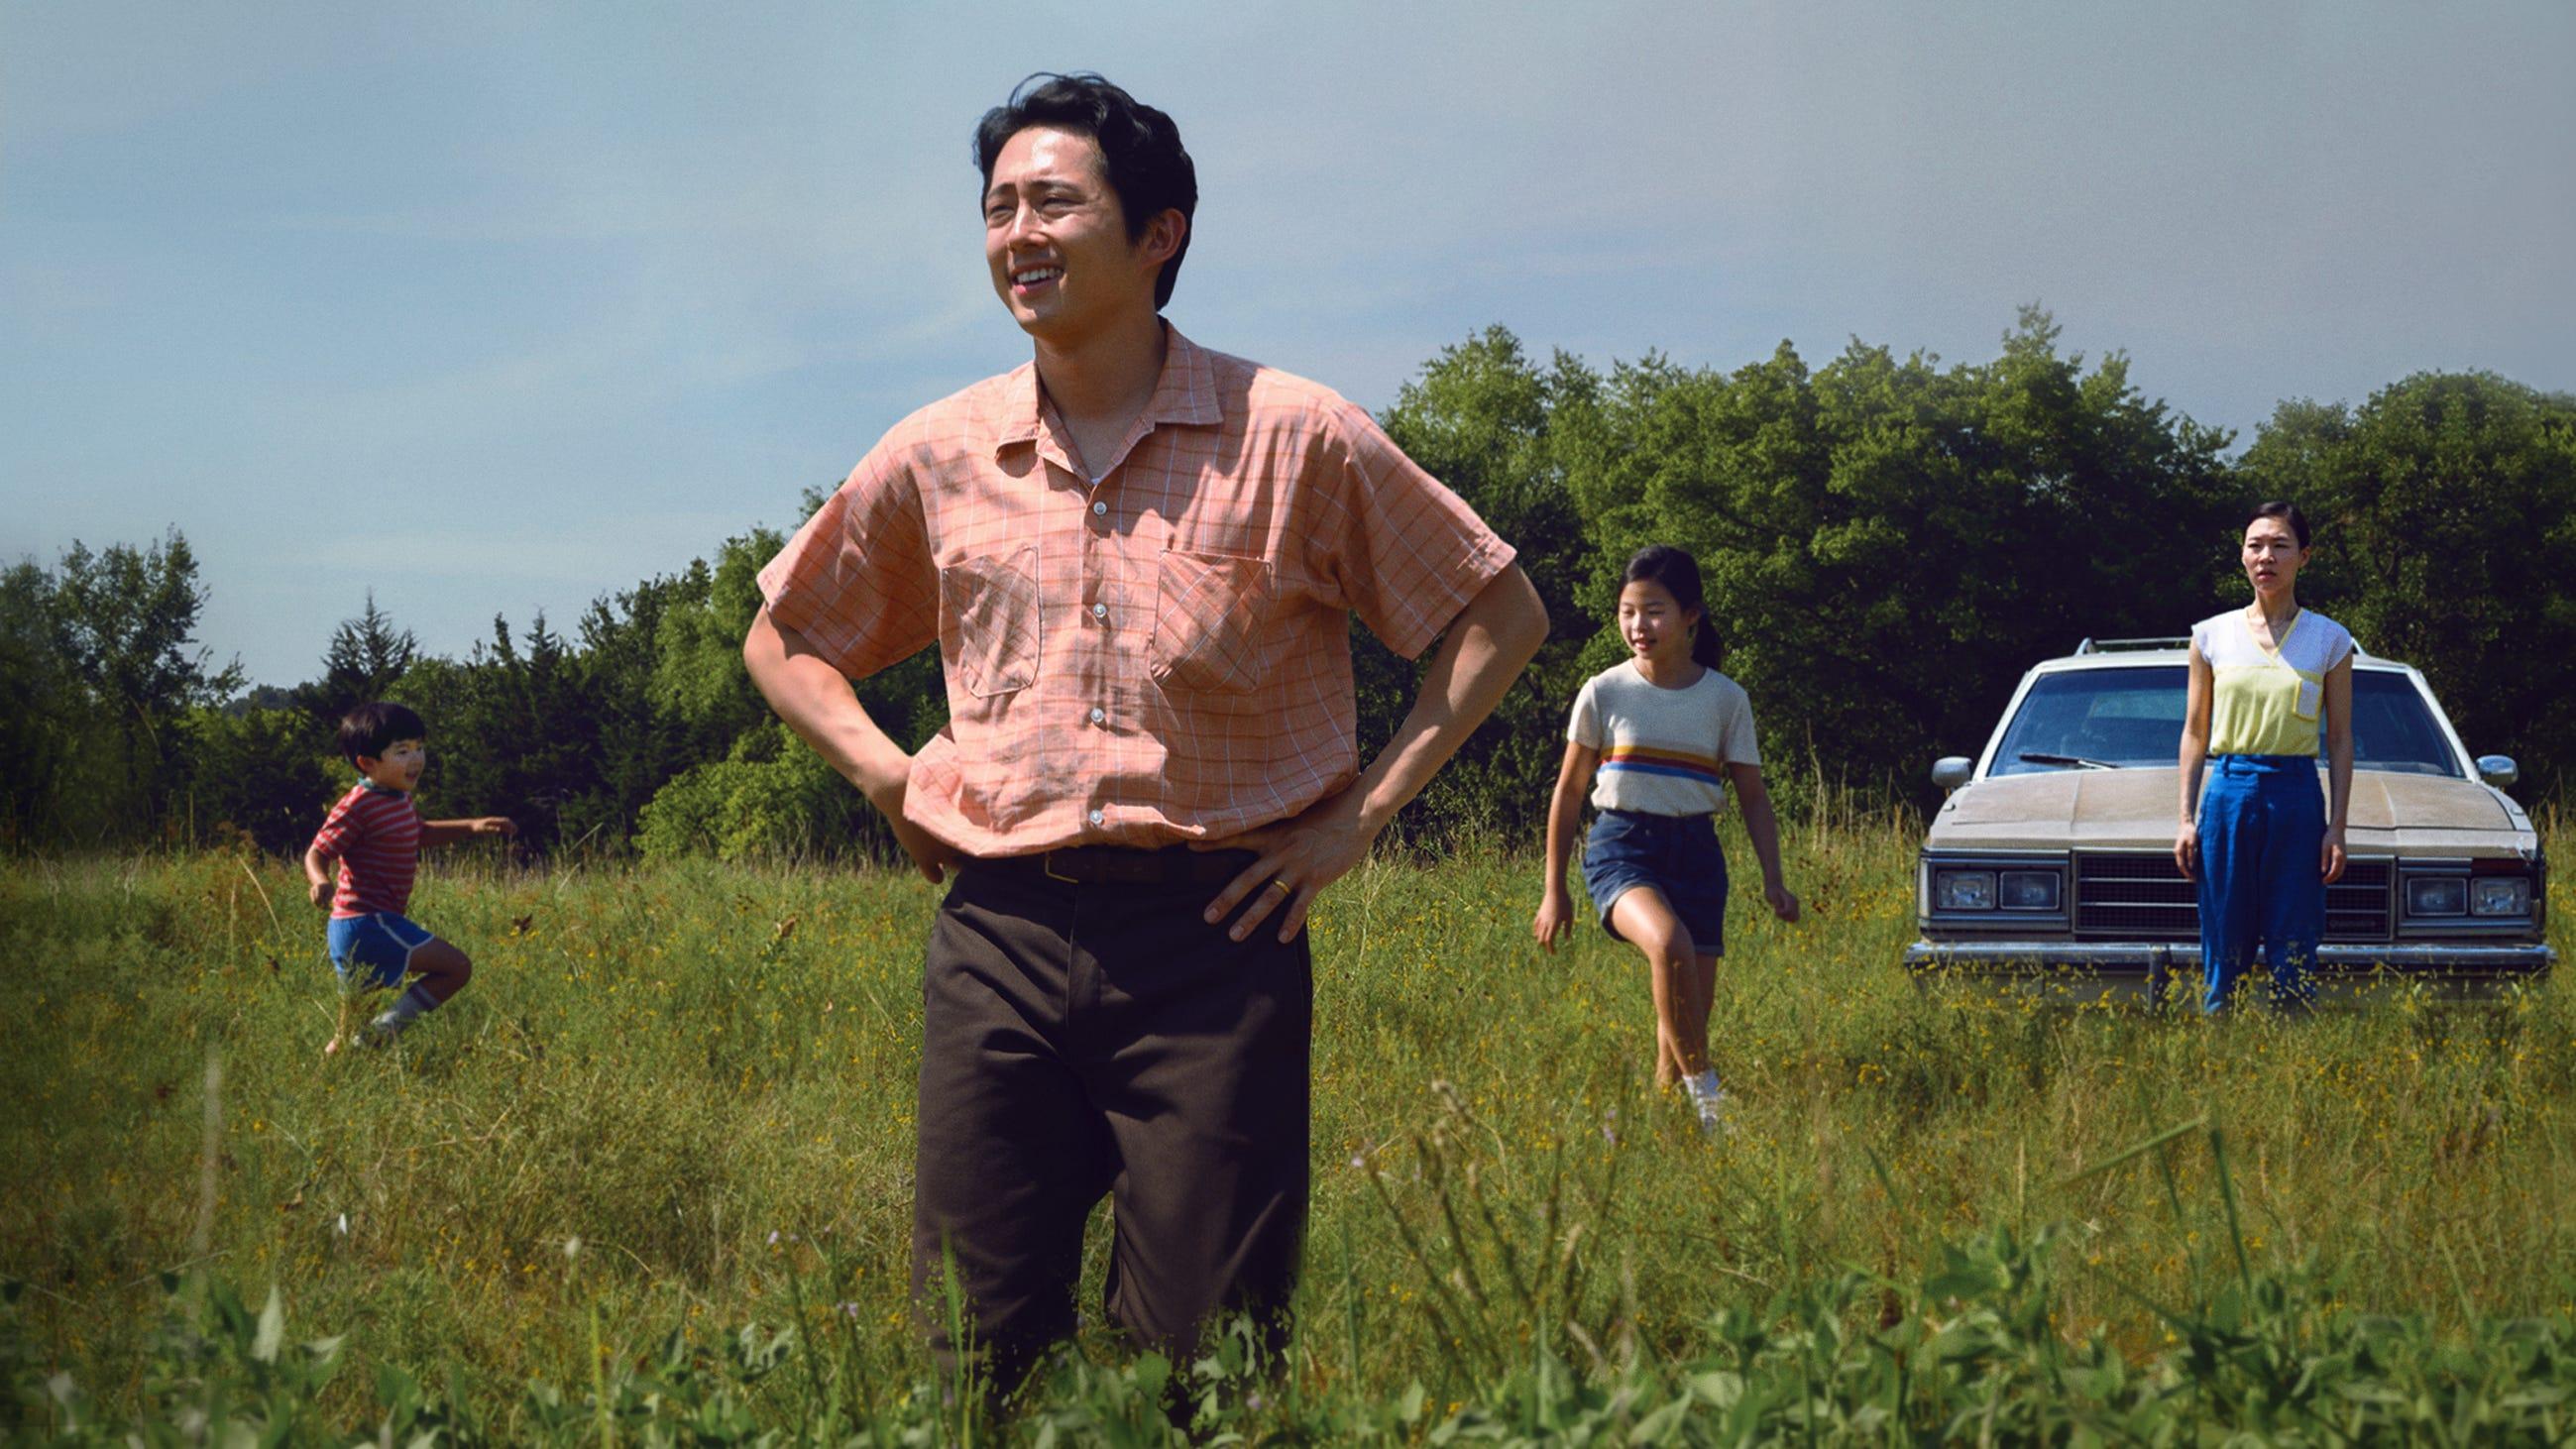 www.freep.com: Steven Yeun, raised in metro Detroit, earns Oscar nomination for best actor in 'Minari'